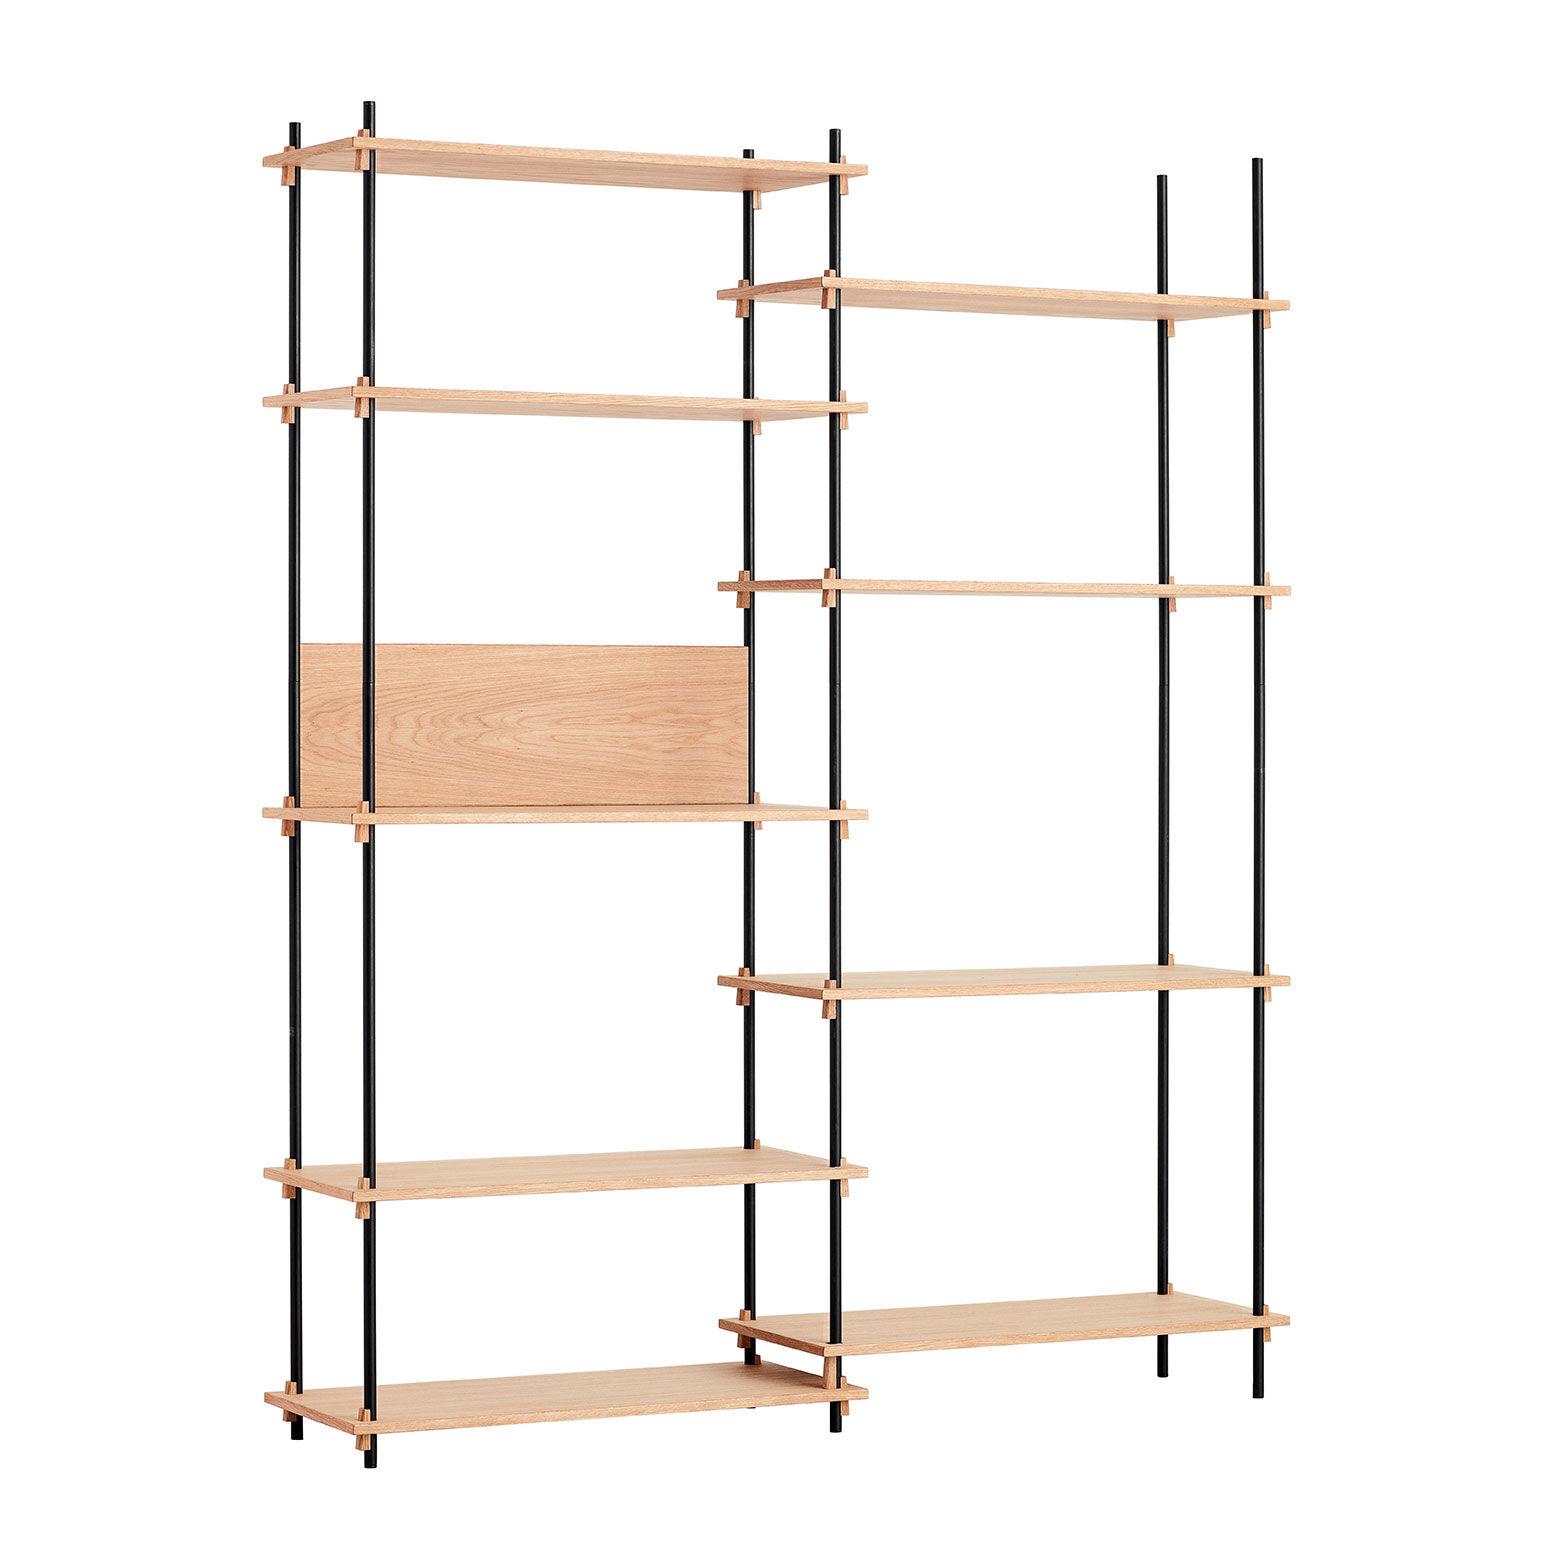 MOEBE Shelving System Shelf Tall Double, Oak